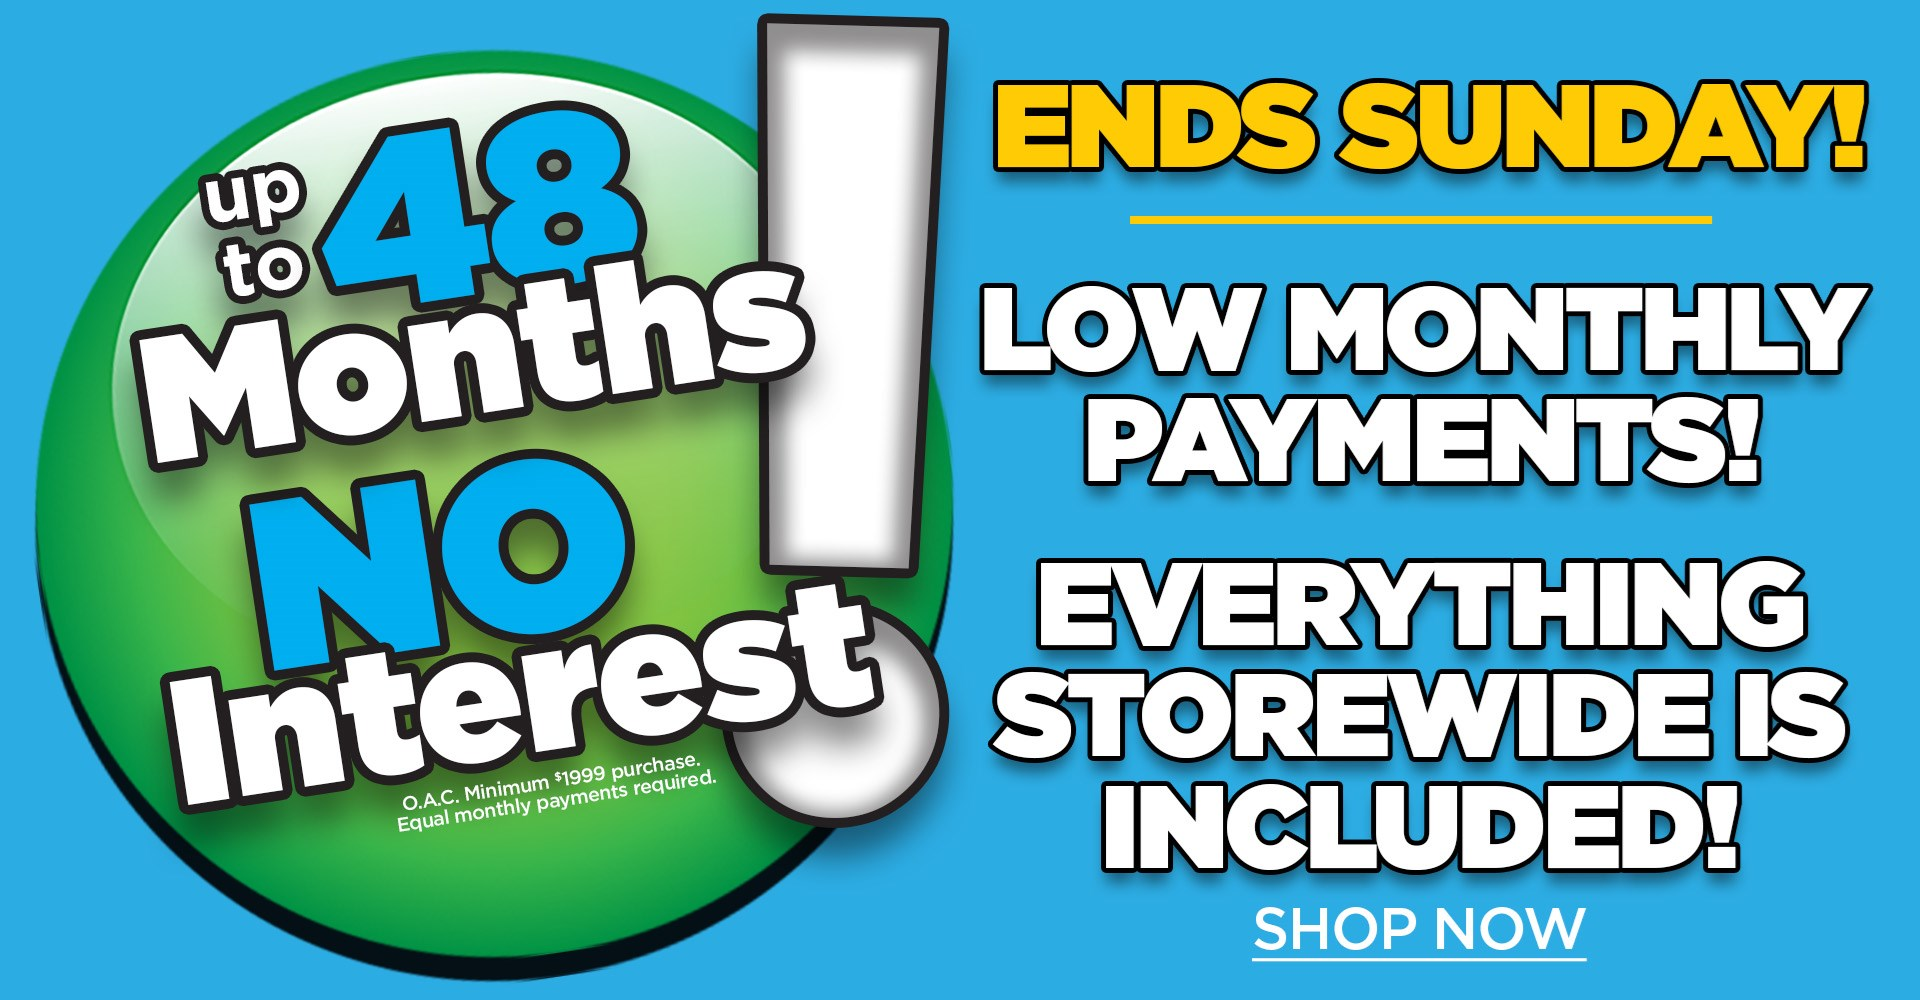 48 Months No Interest Ends Sunday